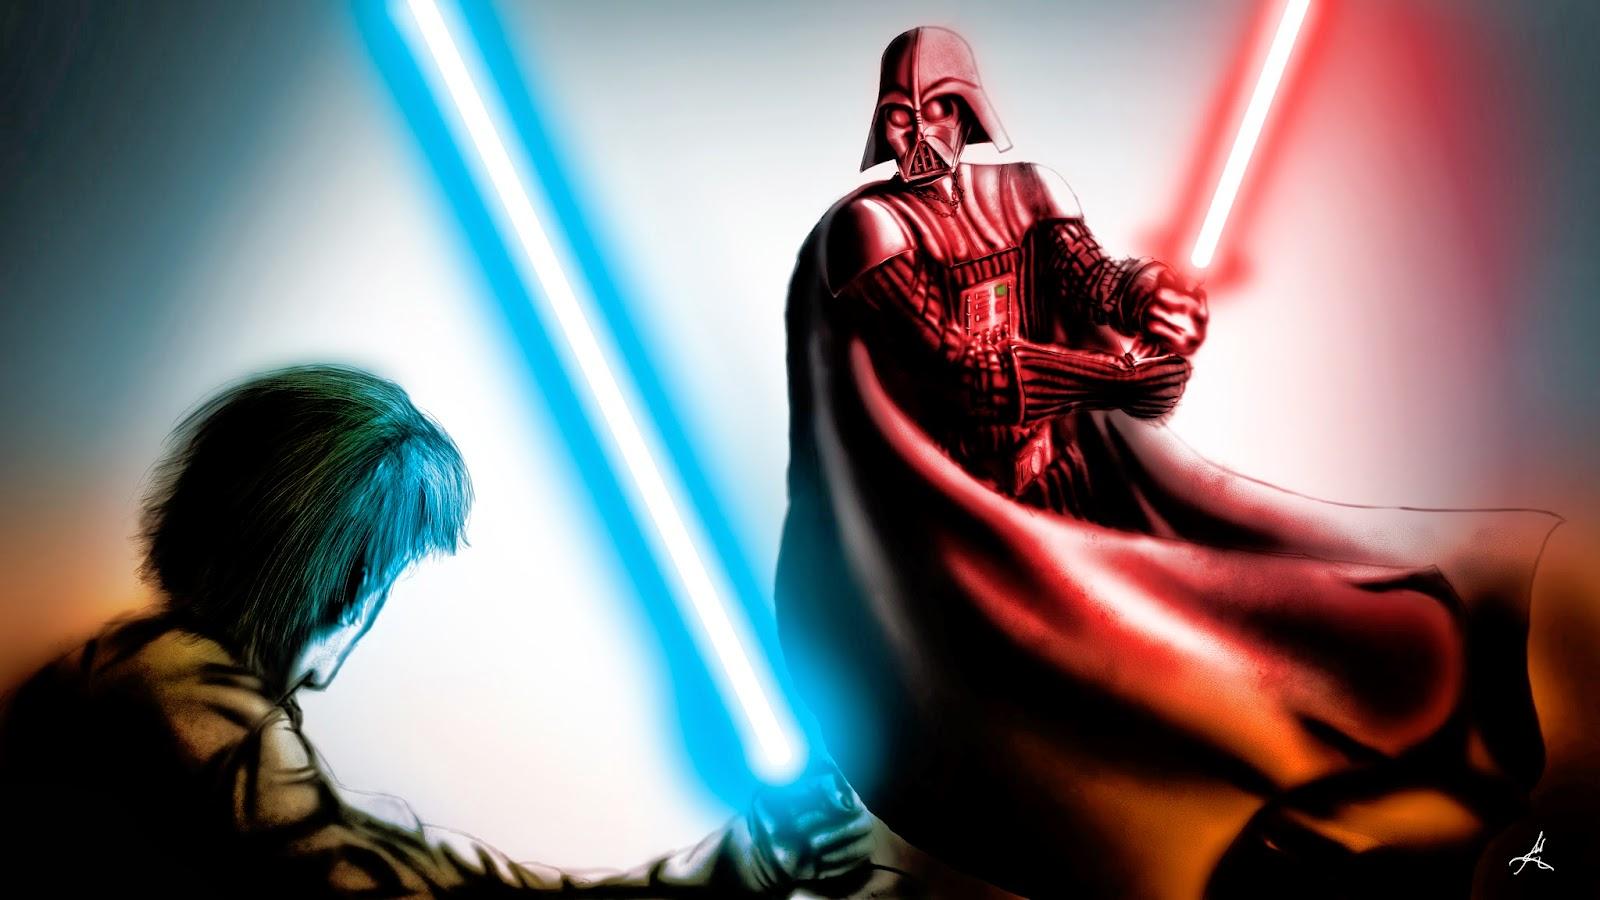 Worksheet. GariiArt Star Wars